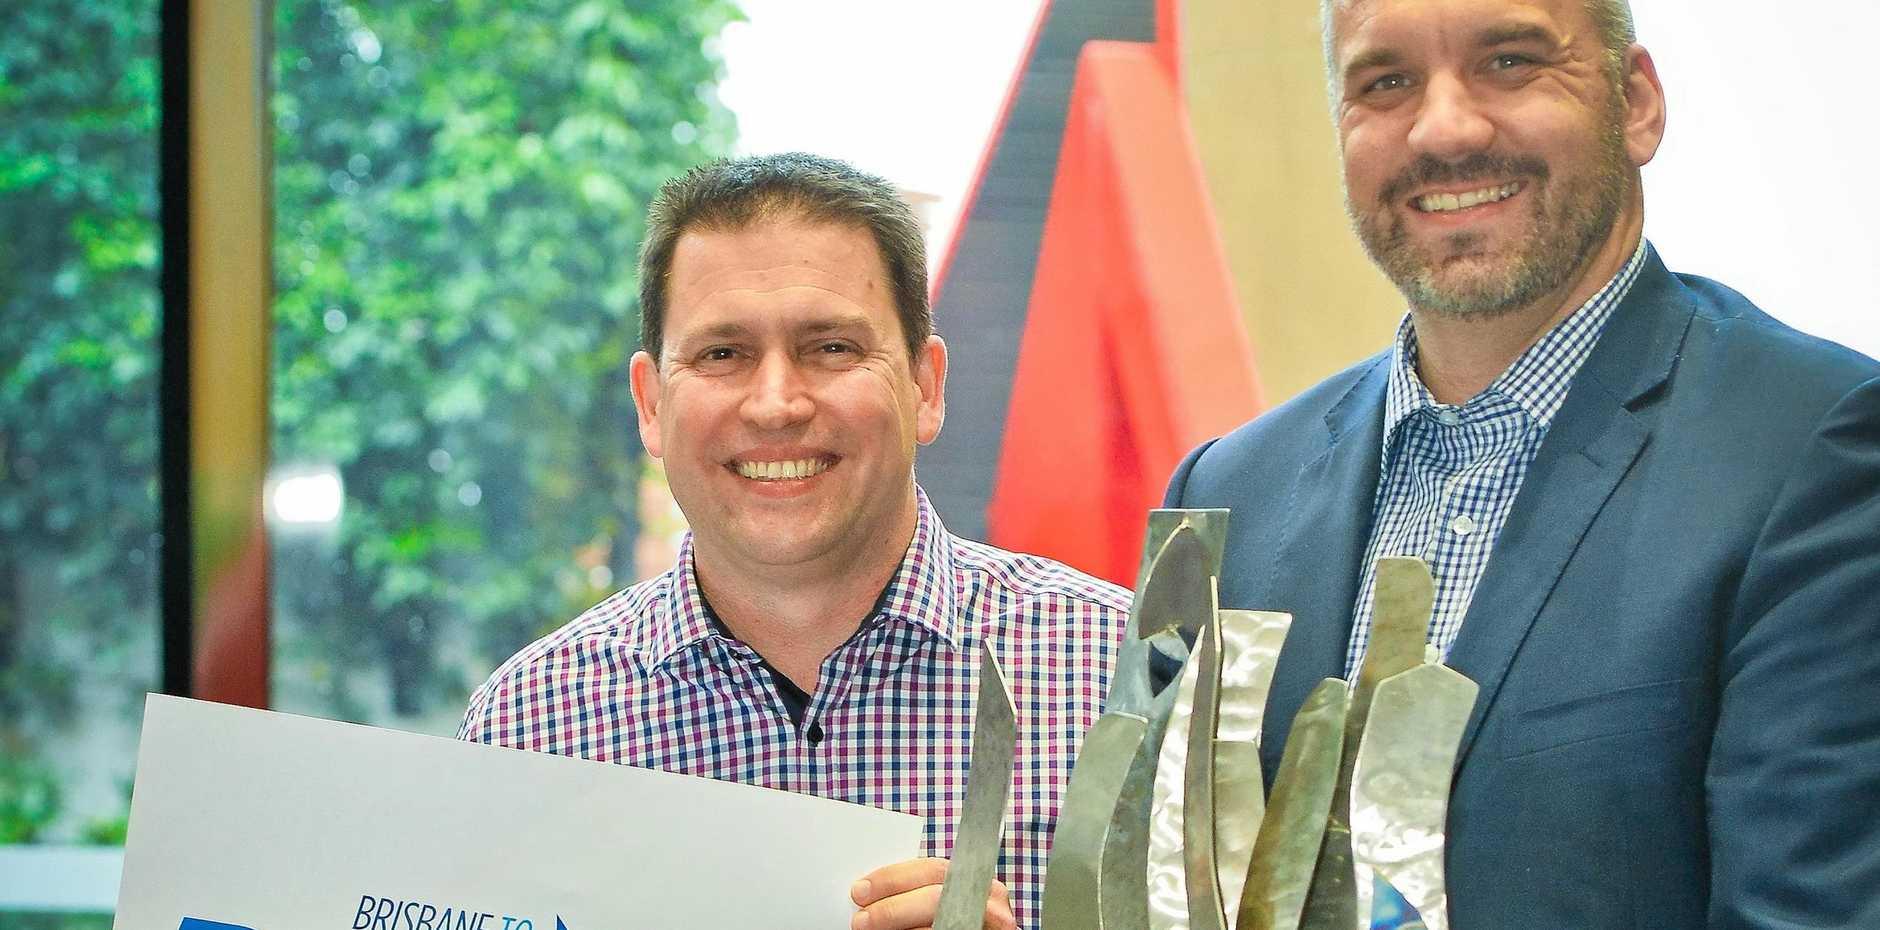 Mayor Matt Burnett and Matthew Bourke from Brisbane City Council with the Brisbane to Gladstone trophy.